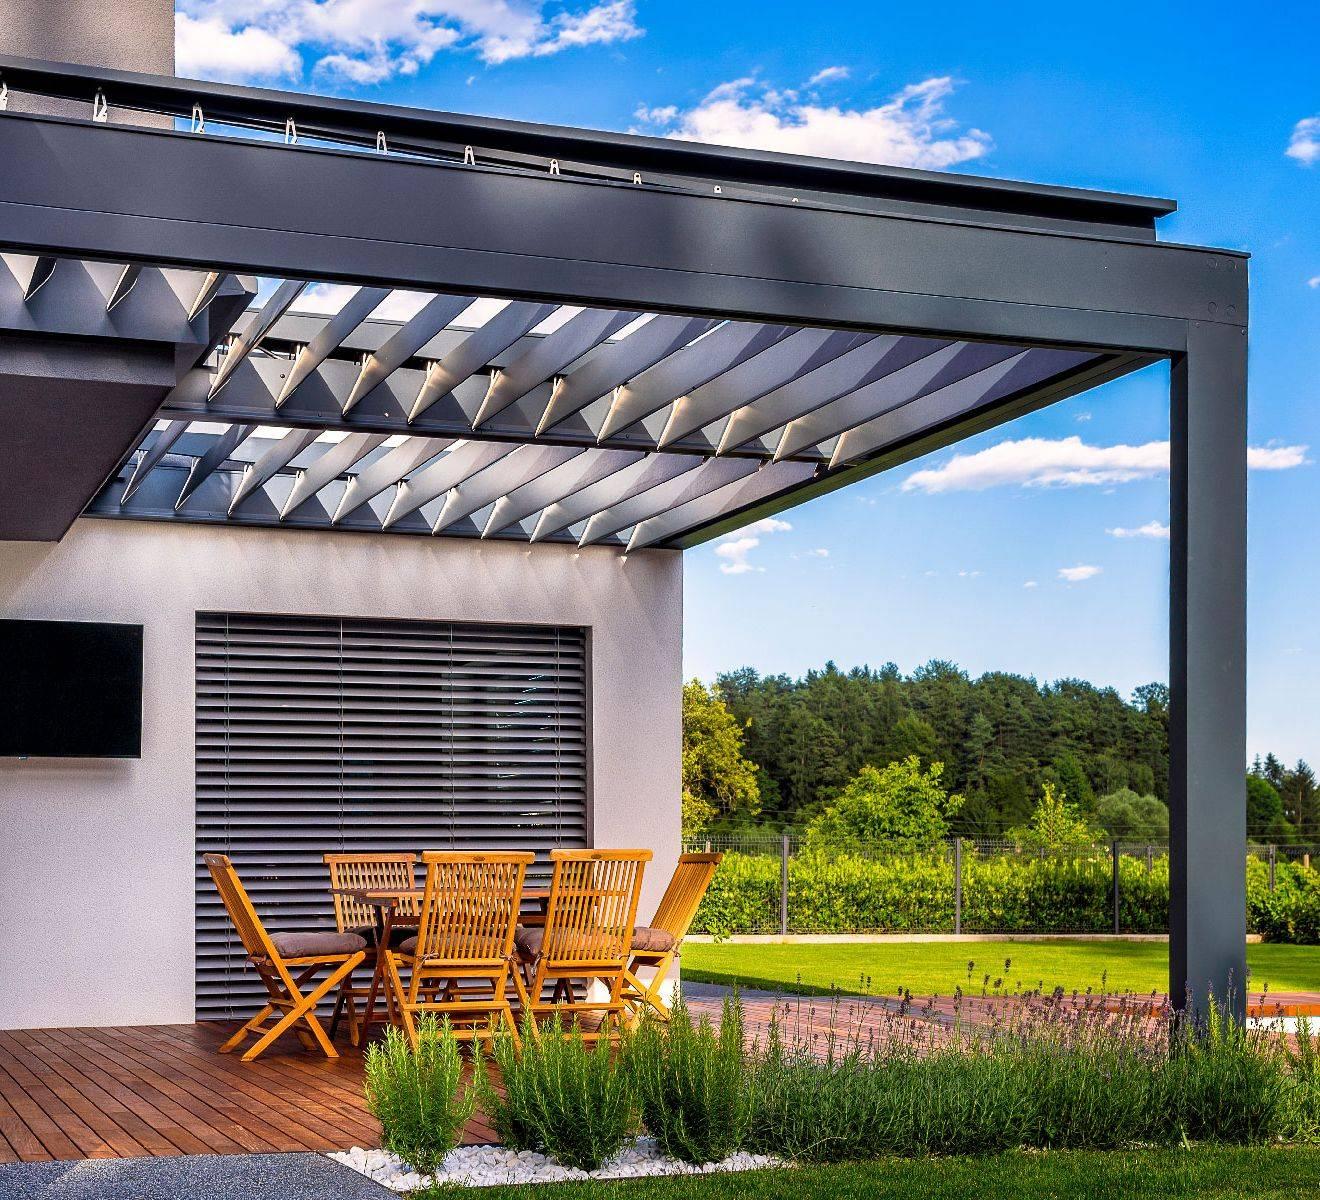 Neuničljive Hard-Top bioklimatske pergole za terase